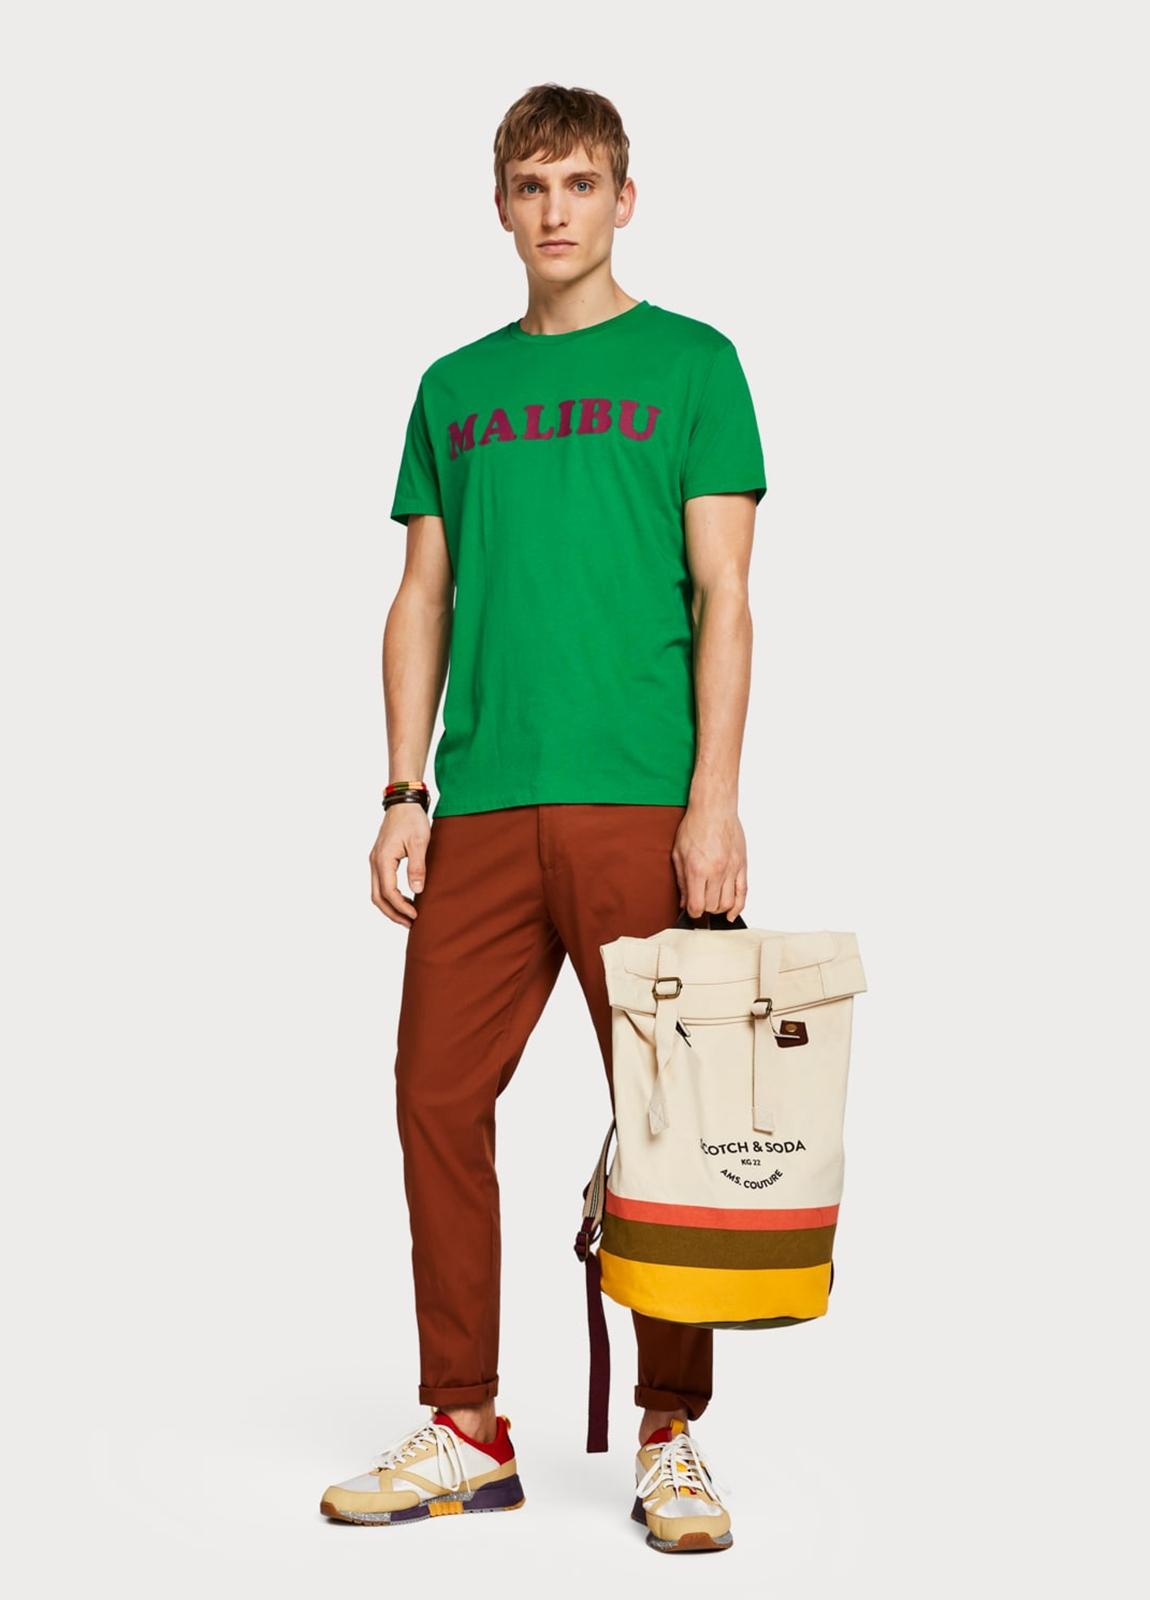 Camiseta SCOTCH & SODA verde - Ítem1